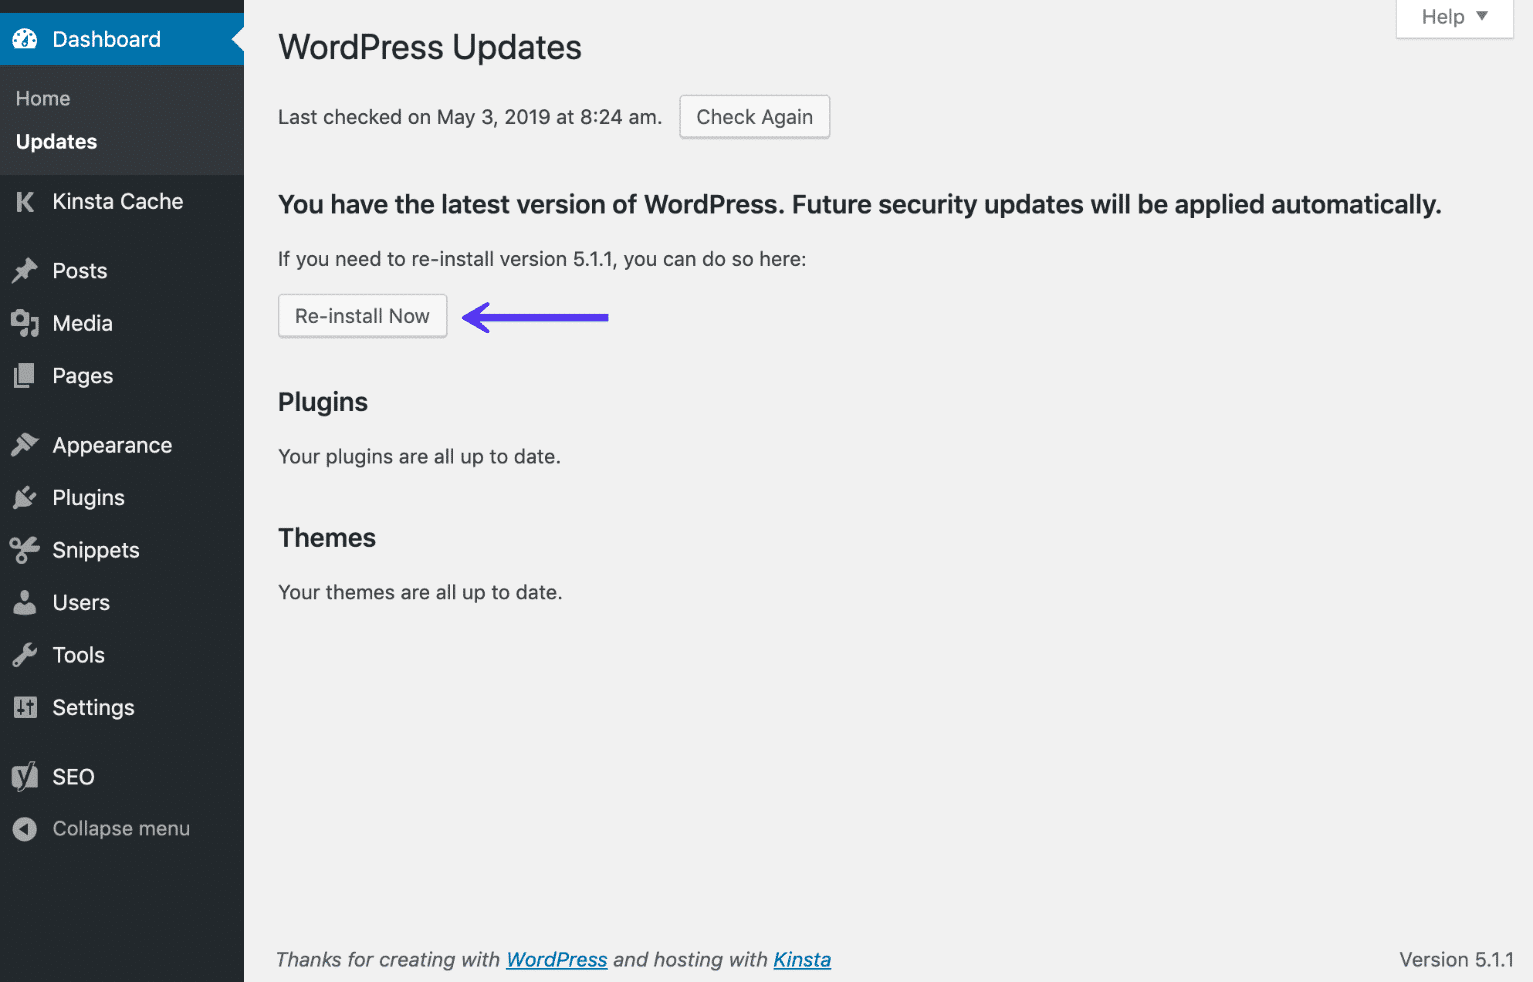 WordPress dashboard re-install now option